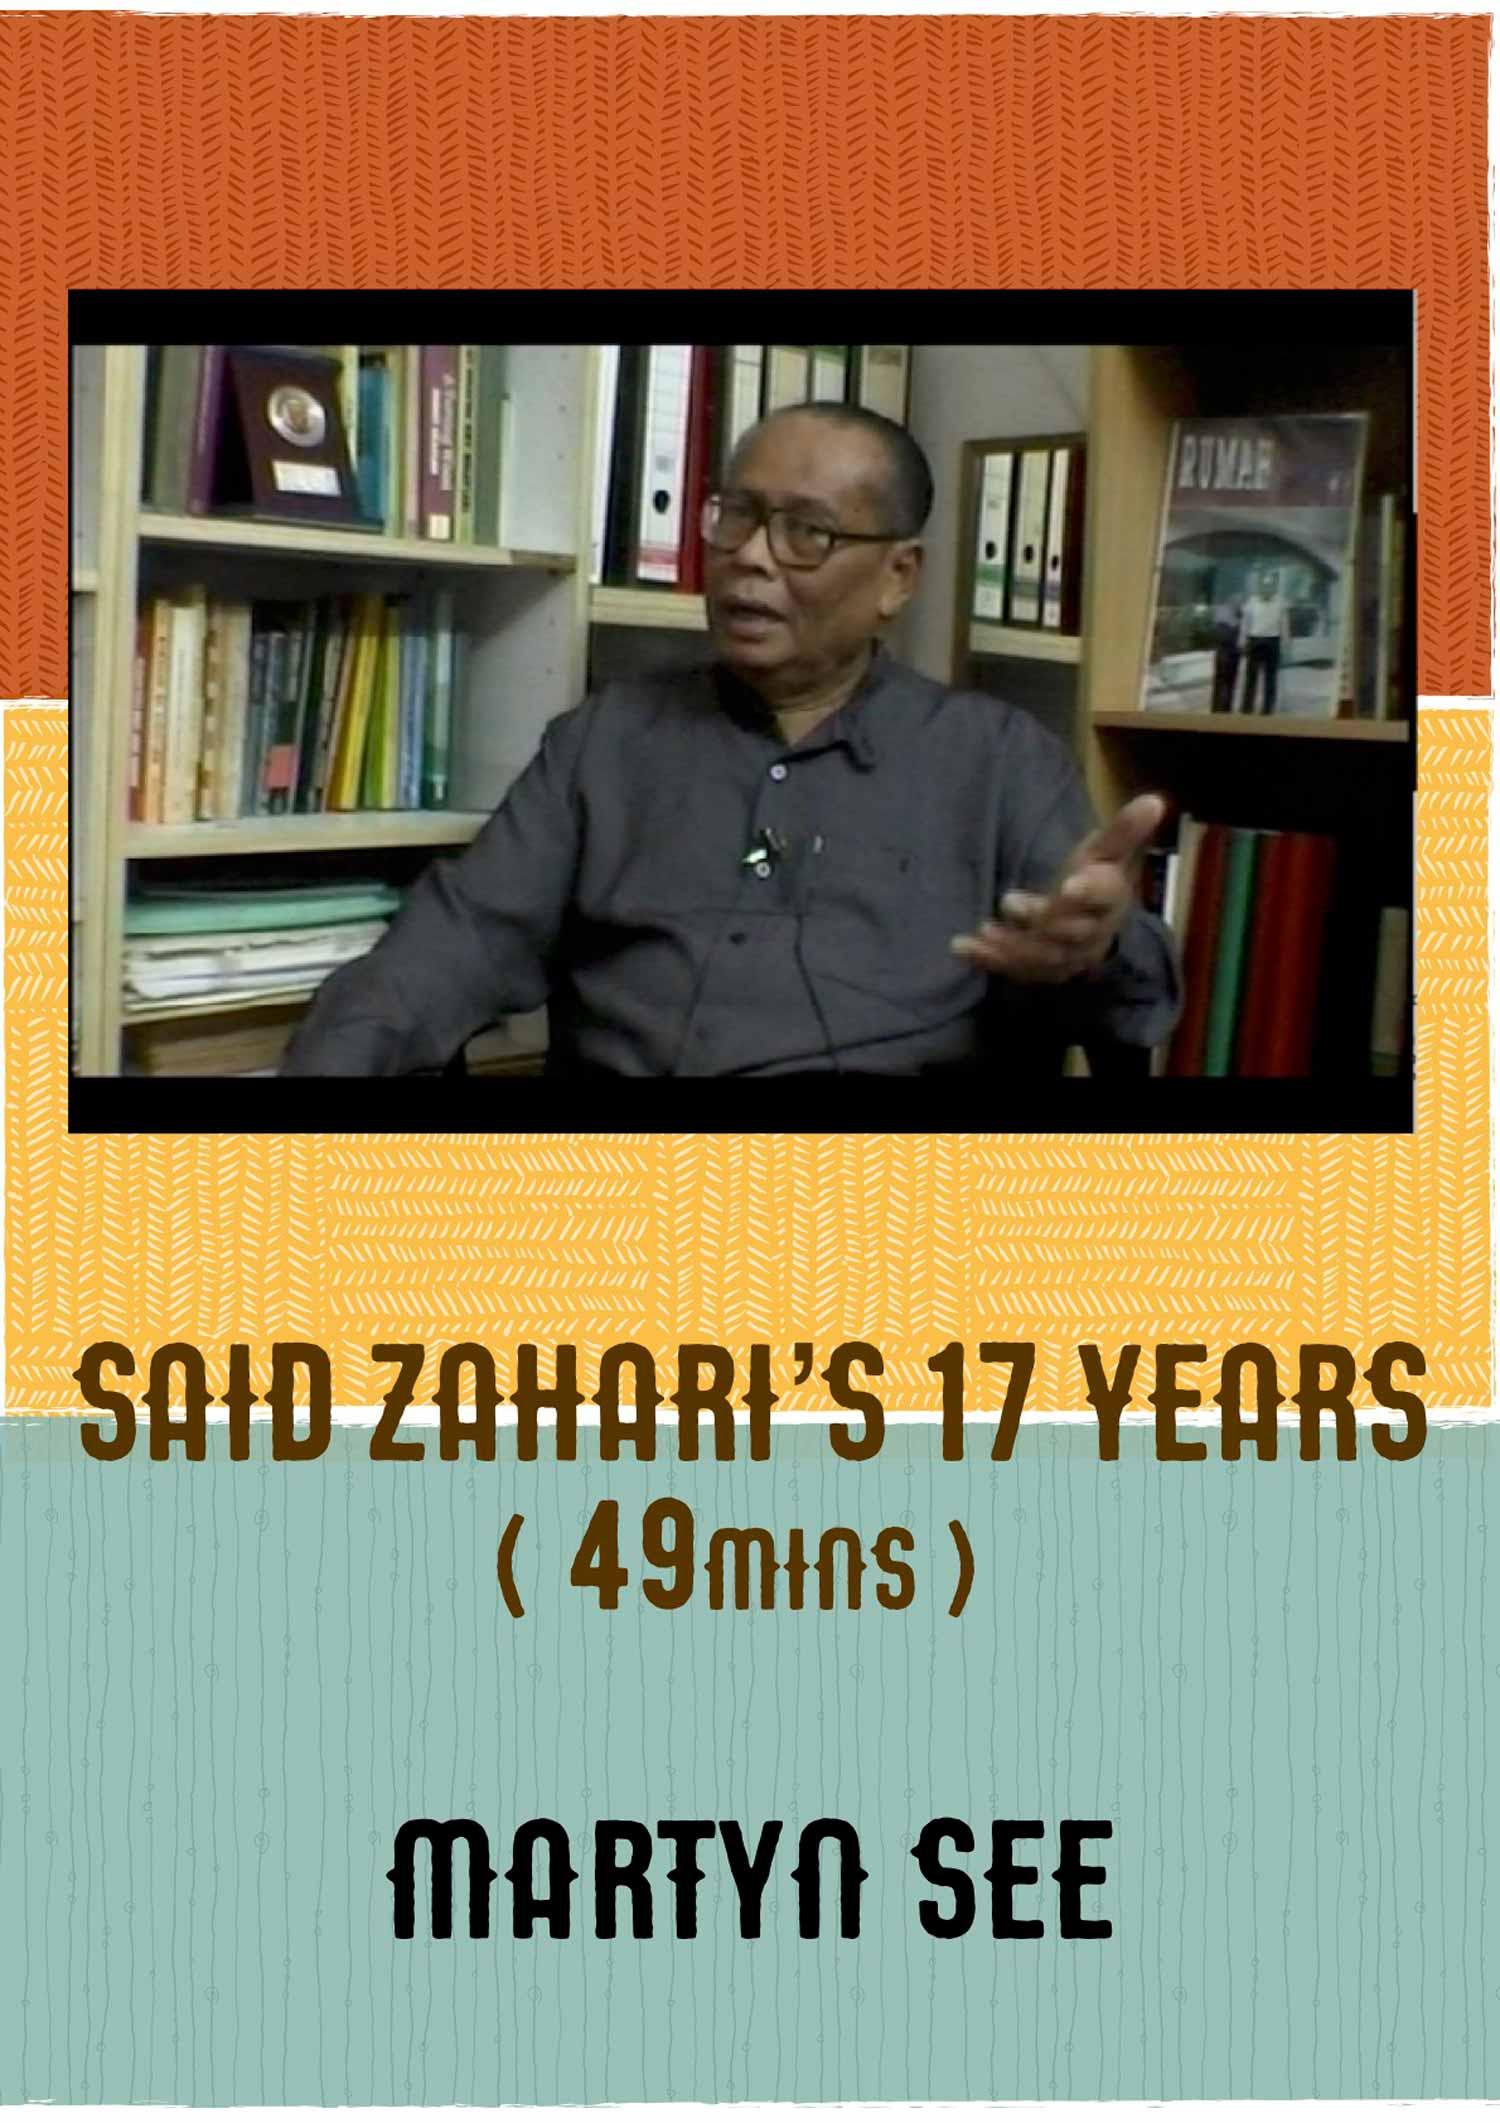 Said Zahari's 17 Years by Martyn See (FreedomFilmFest 2020)